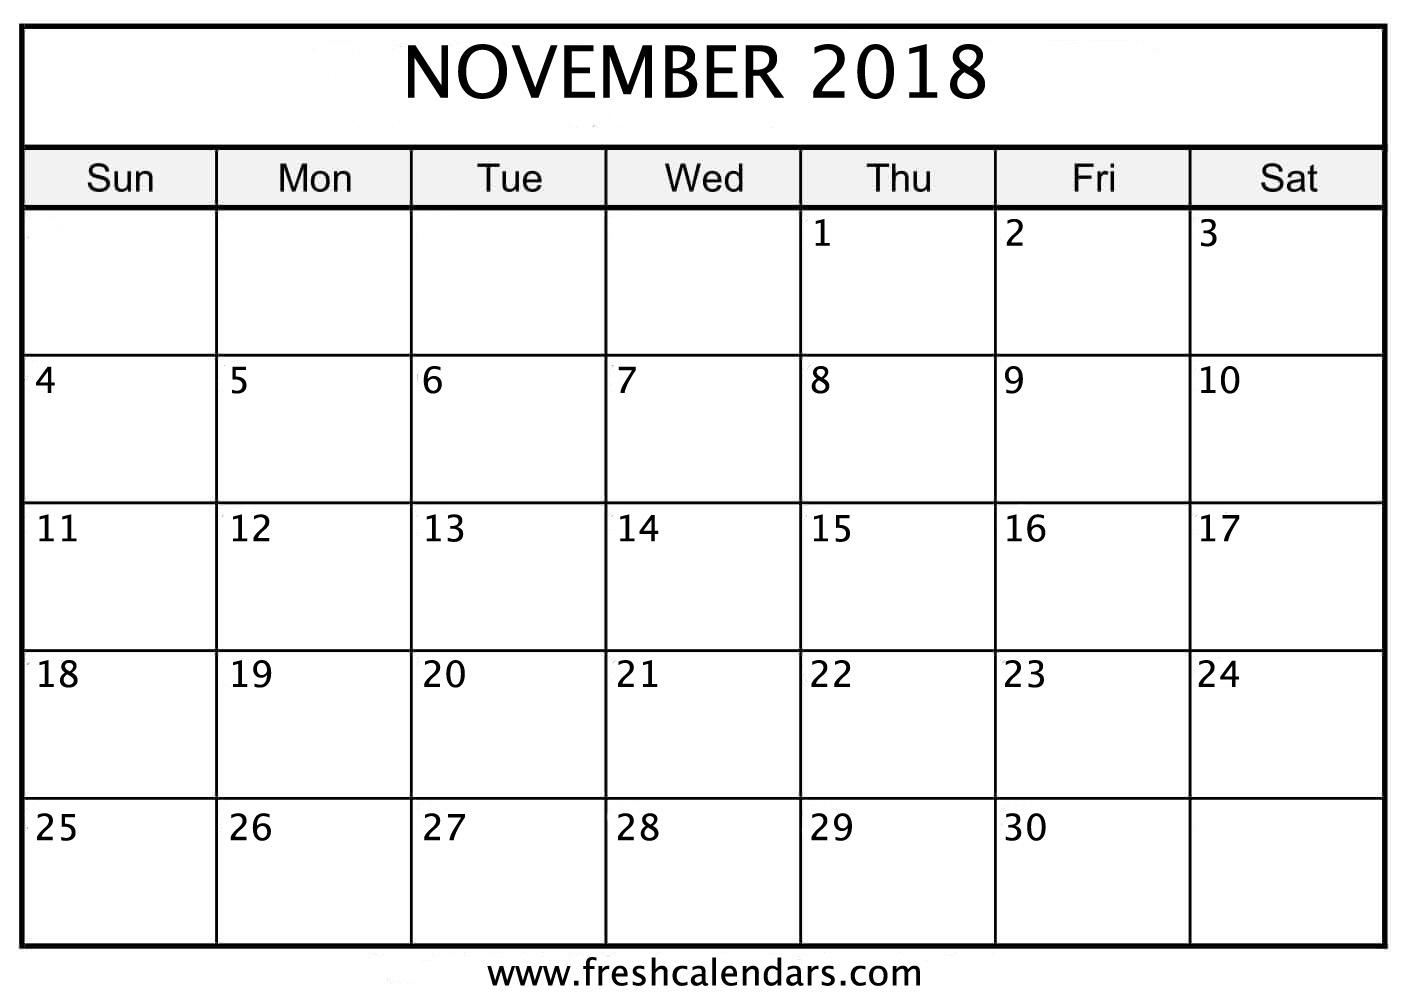 November 2018 Calendar Printable - Fresh Calendars with regard to Blank Printable November Calendar